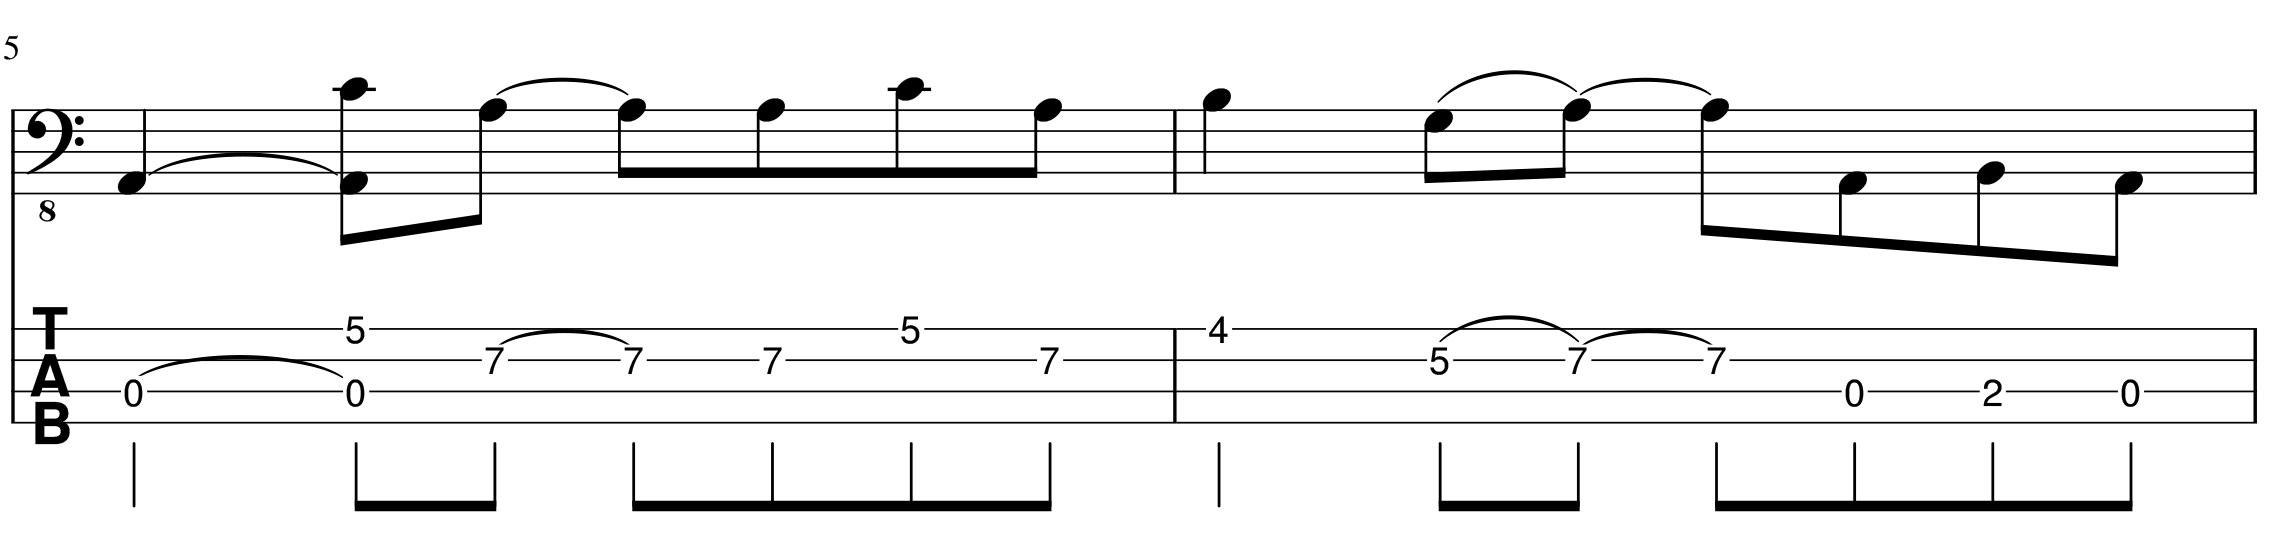 Bass-lernen-für-Anfänger-Bassline-2_3